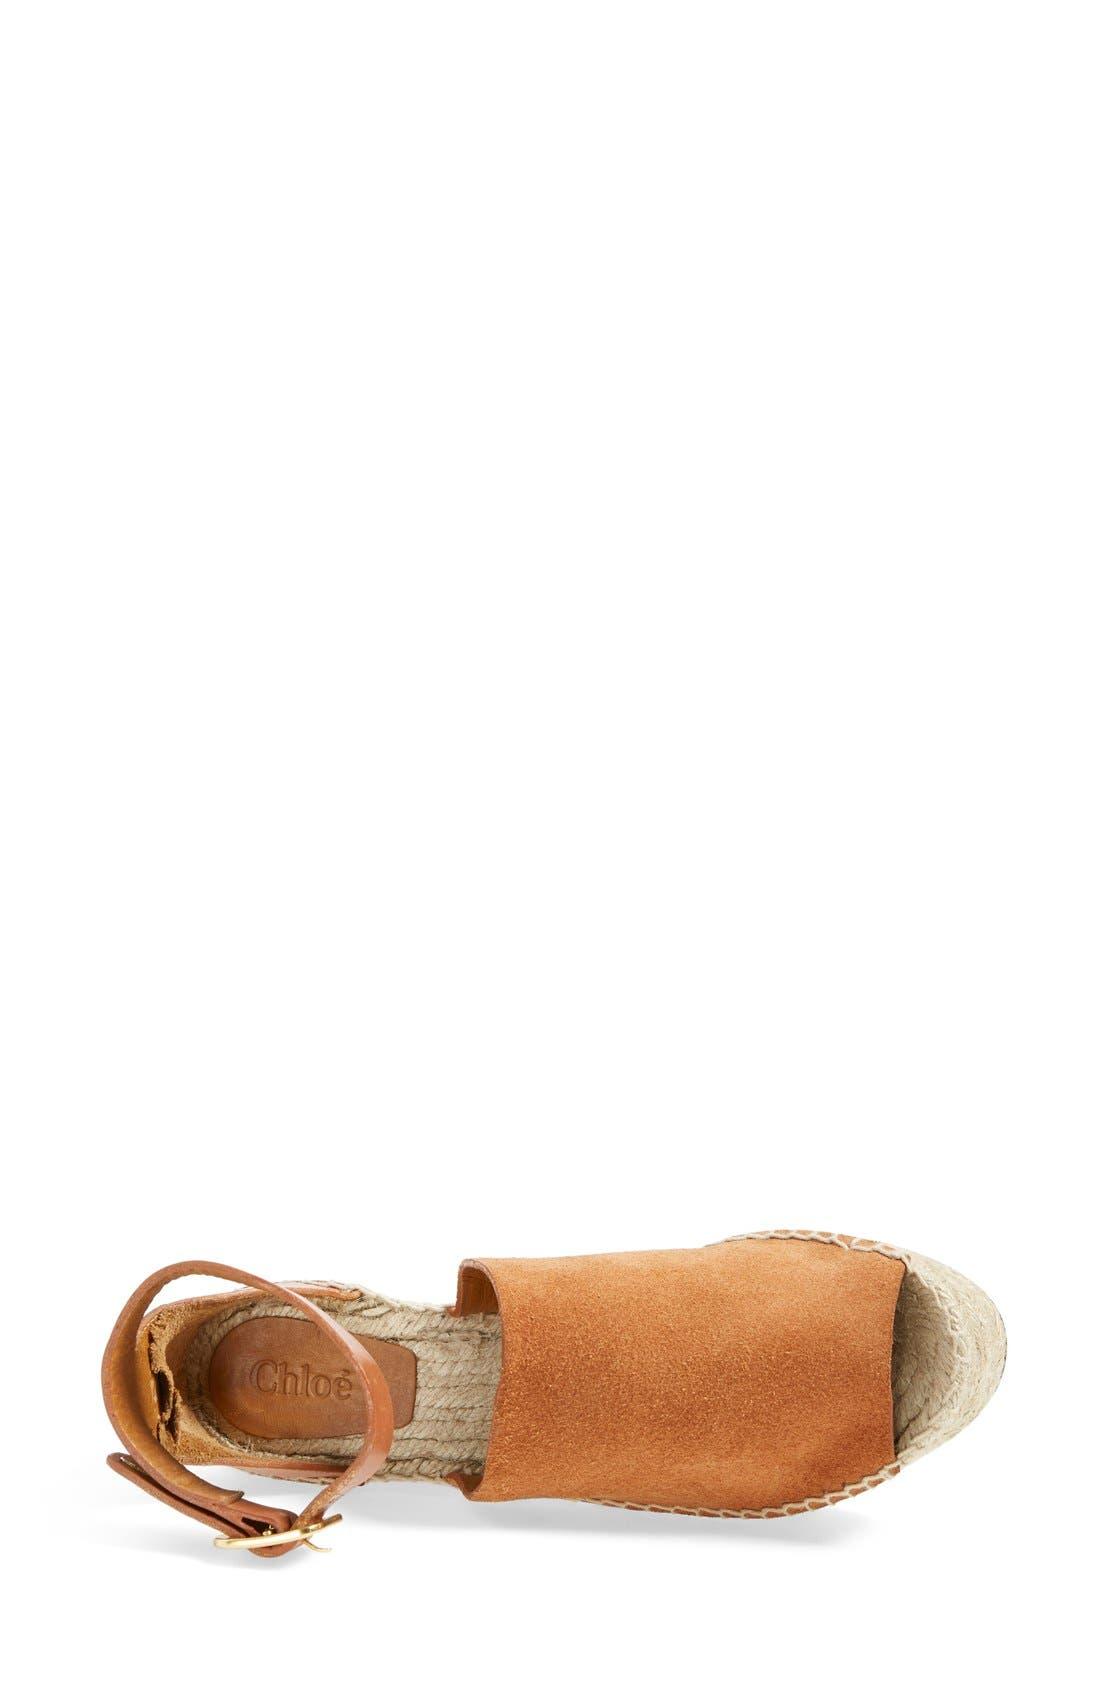 'Isa' Espadrille Wedge Sandal,                             Alternate thumbnail 6, color,                             200